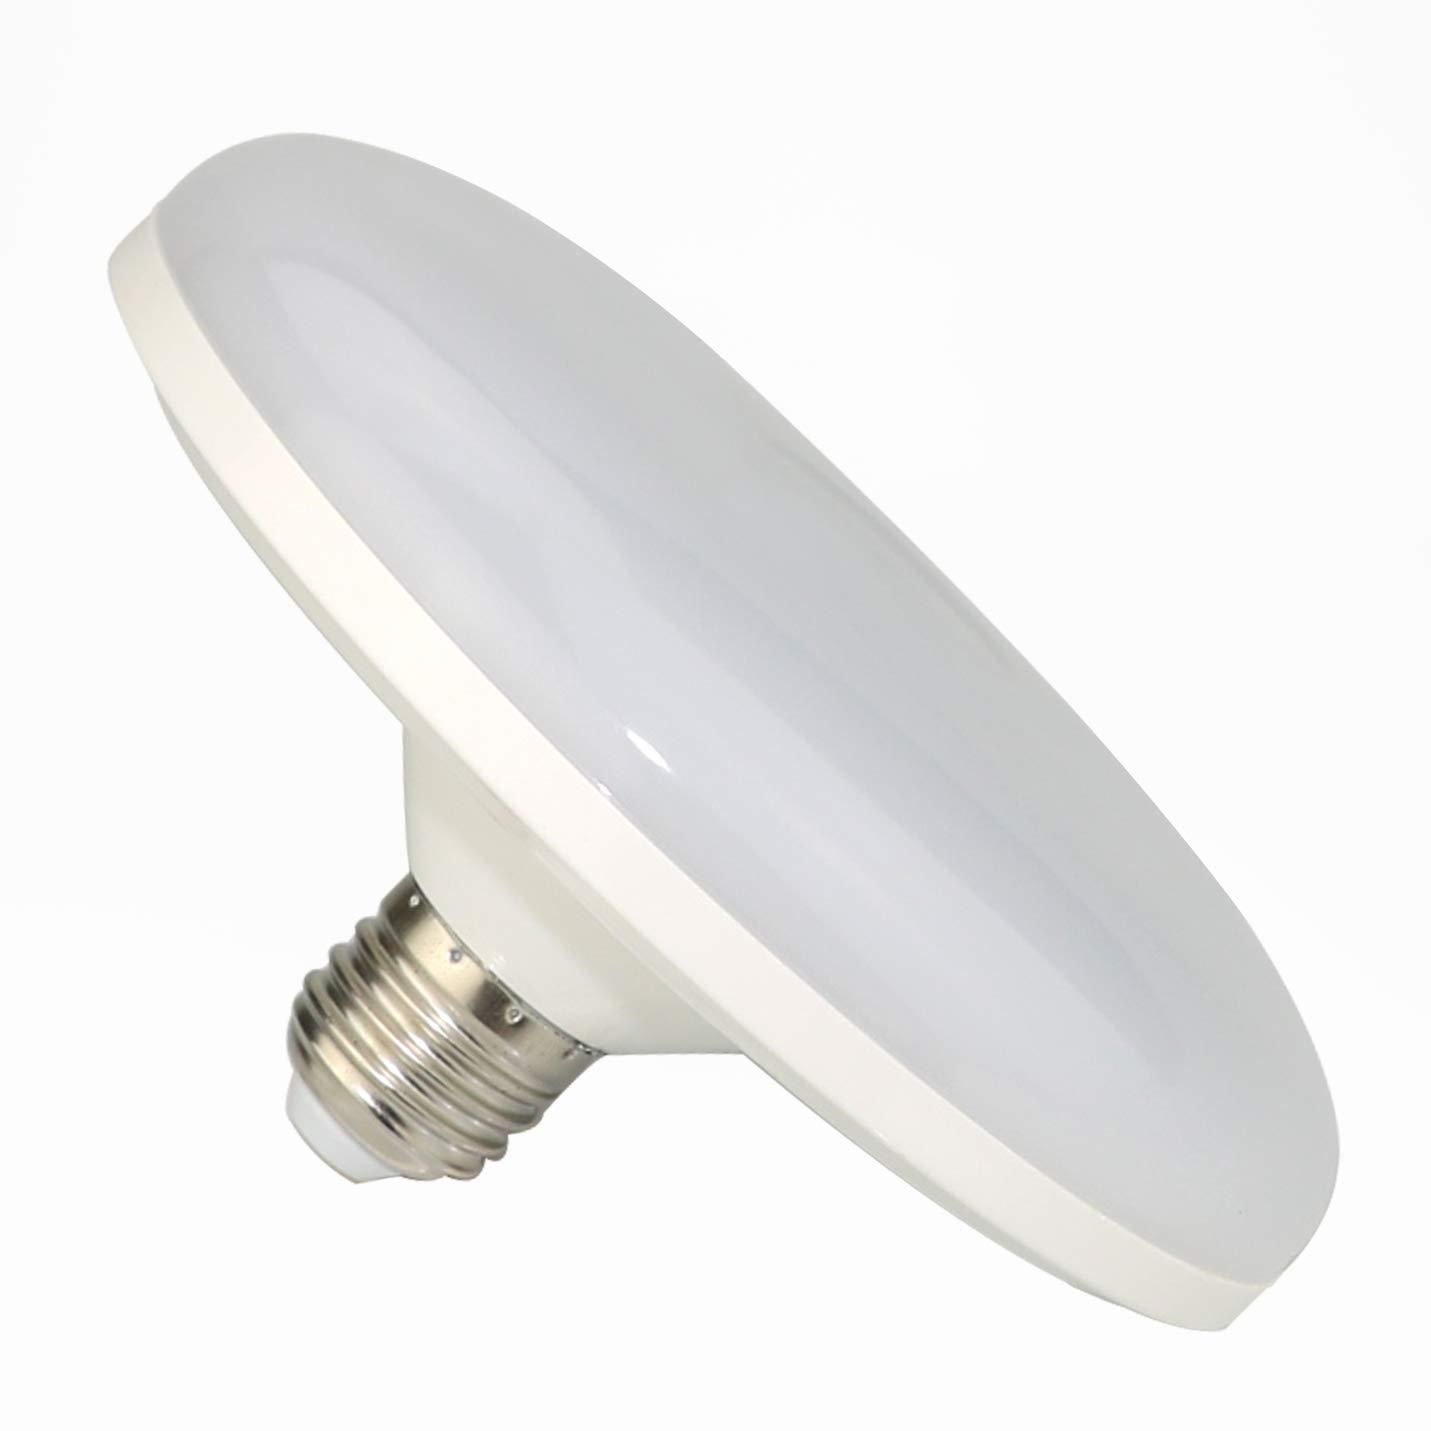 Awanber LED Ceiling Light Bulbs E27 15 Watt Indoor/Outdoor Night Lamp Light for Hallway,Stairs,Depot,Kitchen,Bathroom,Toilet 1300 Lumen 6000K